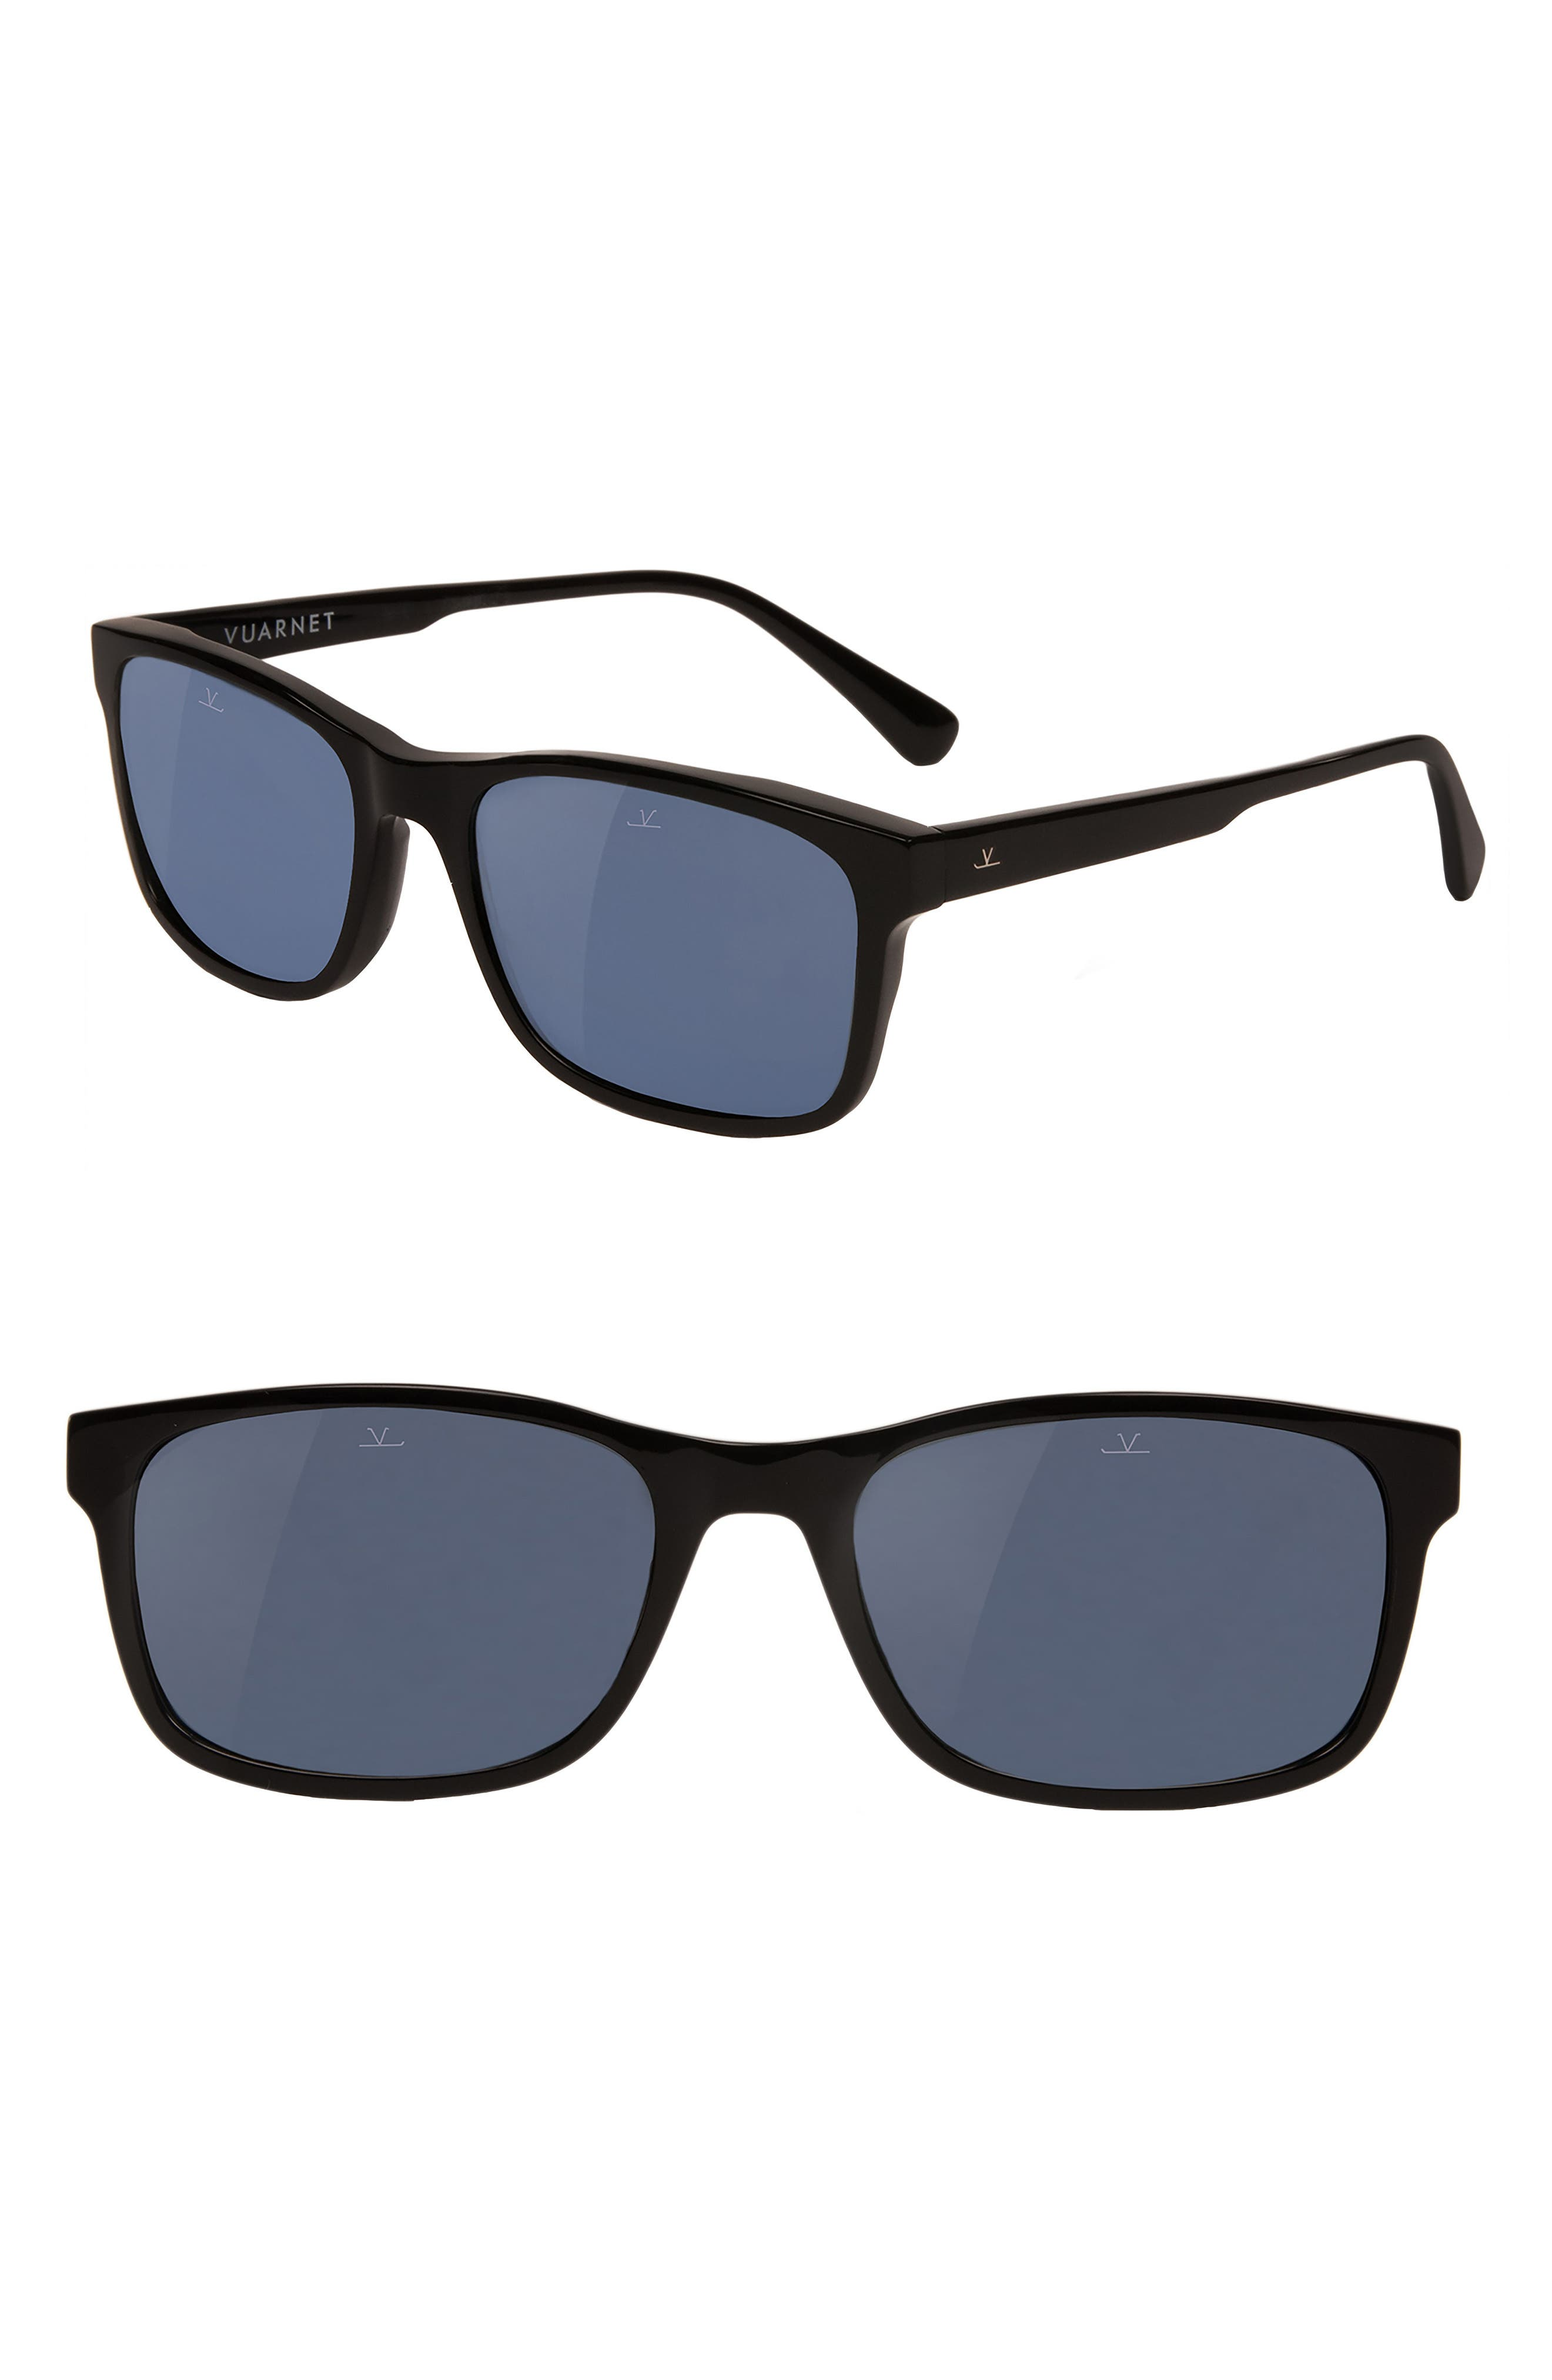 District Medium 55mm Polarized Sunglasses,                         Main,                         color,